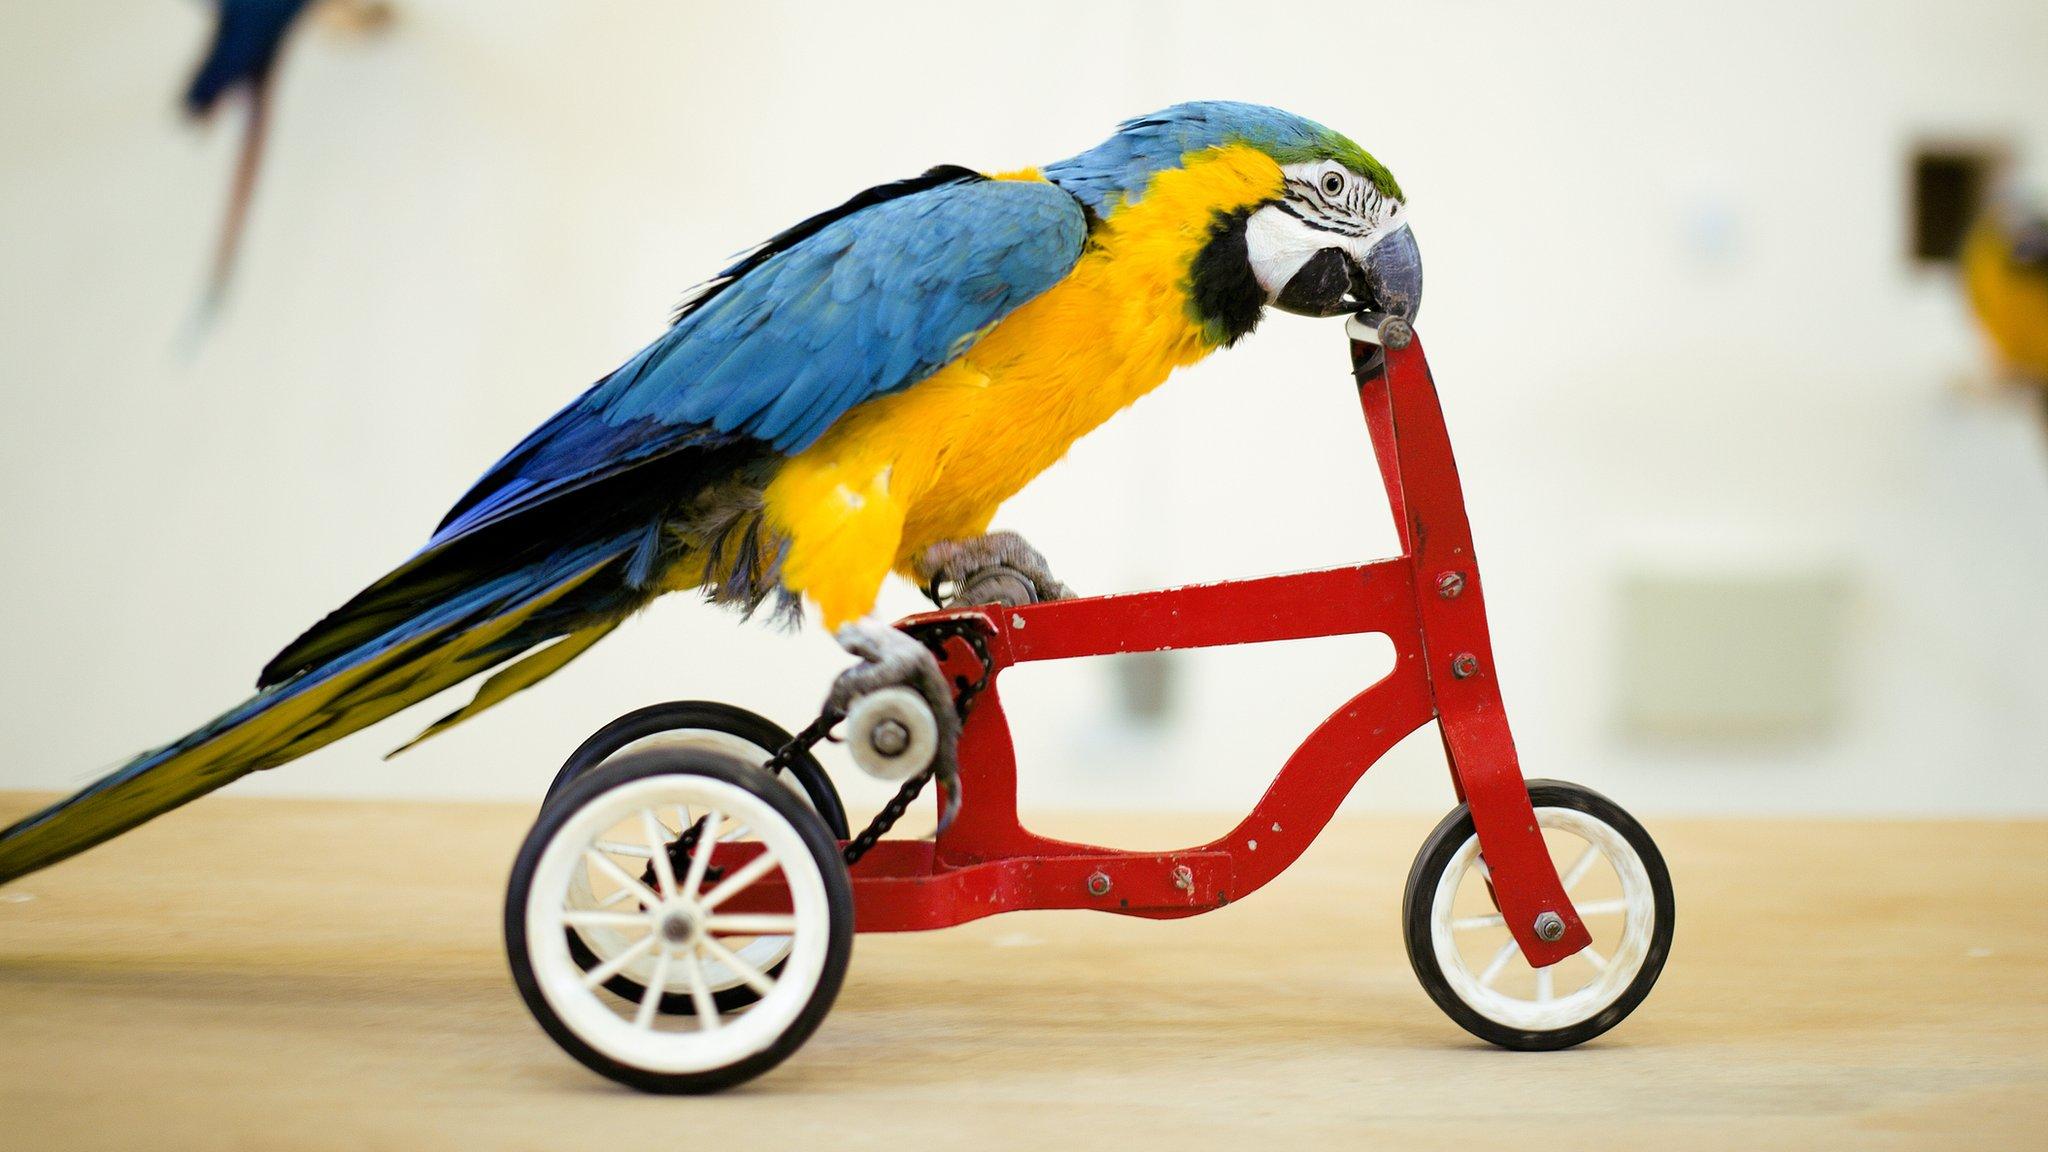 Google bans birds on bikes from algorithm contest